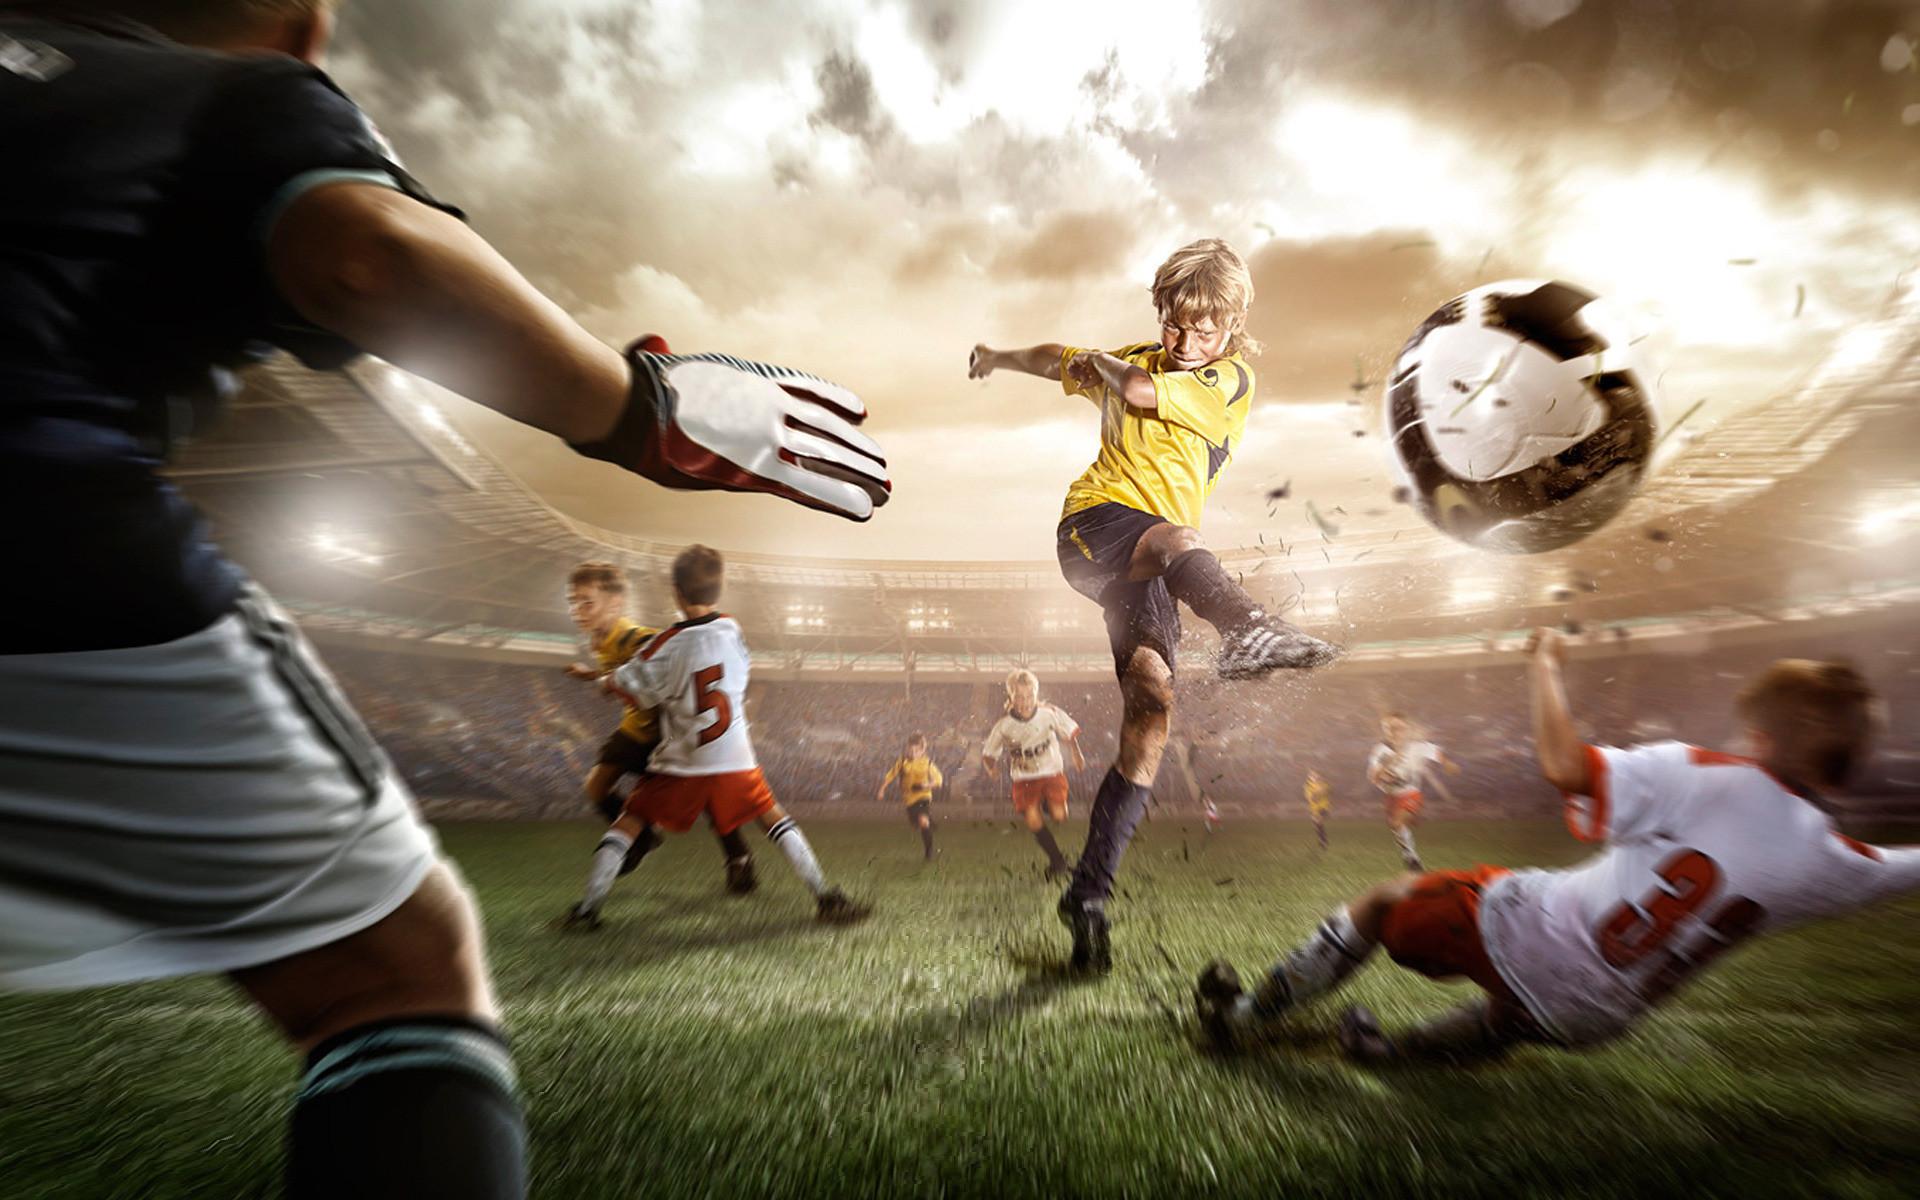 Playing Football Widescreen